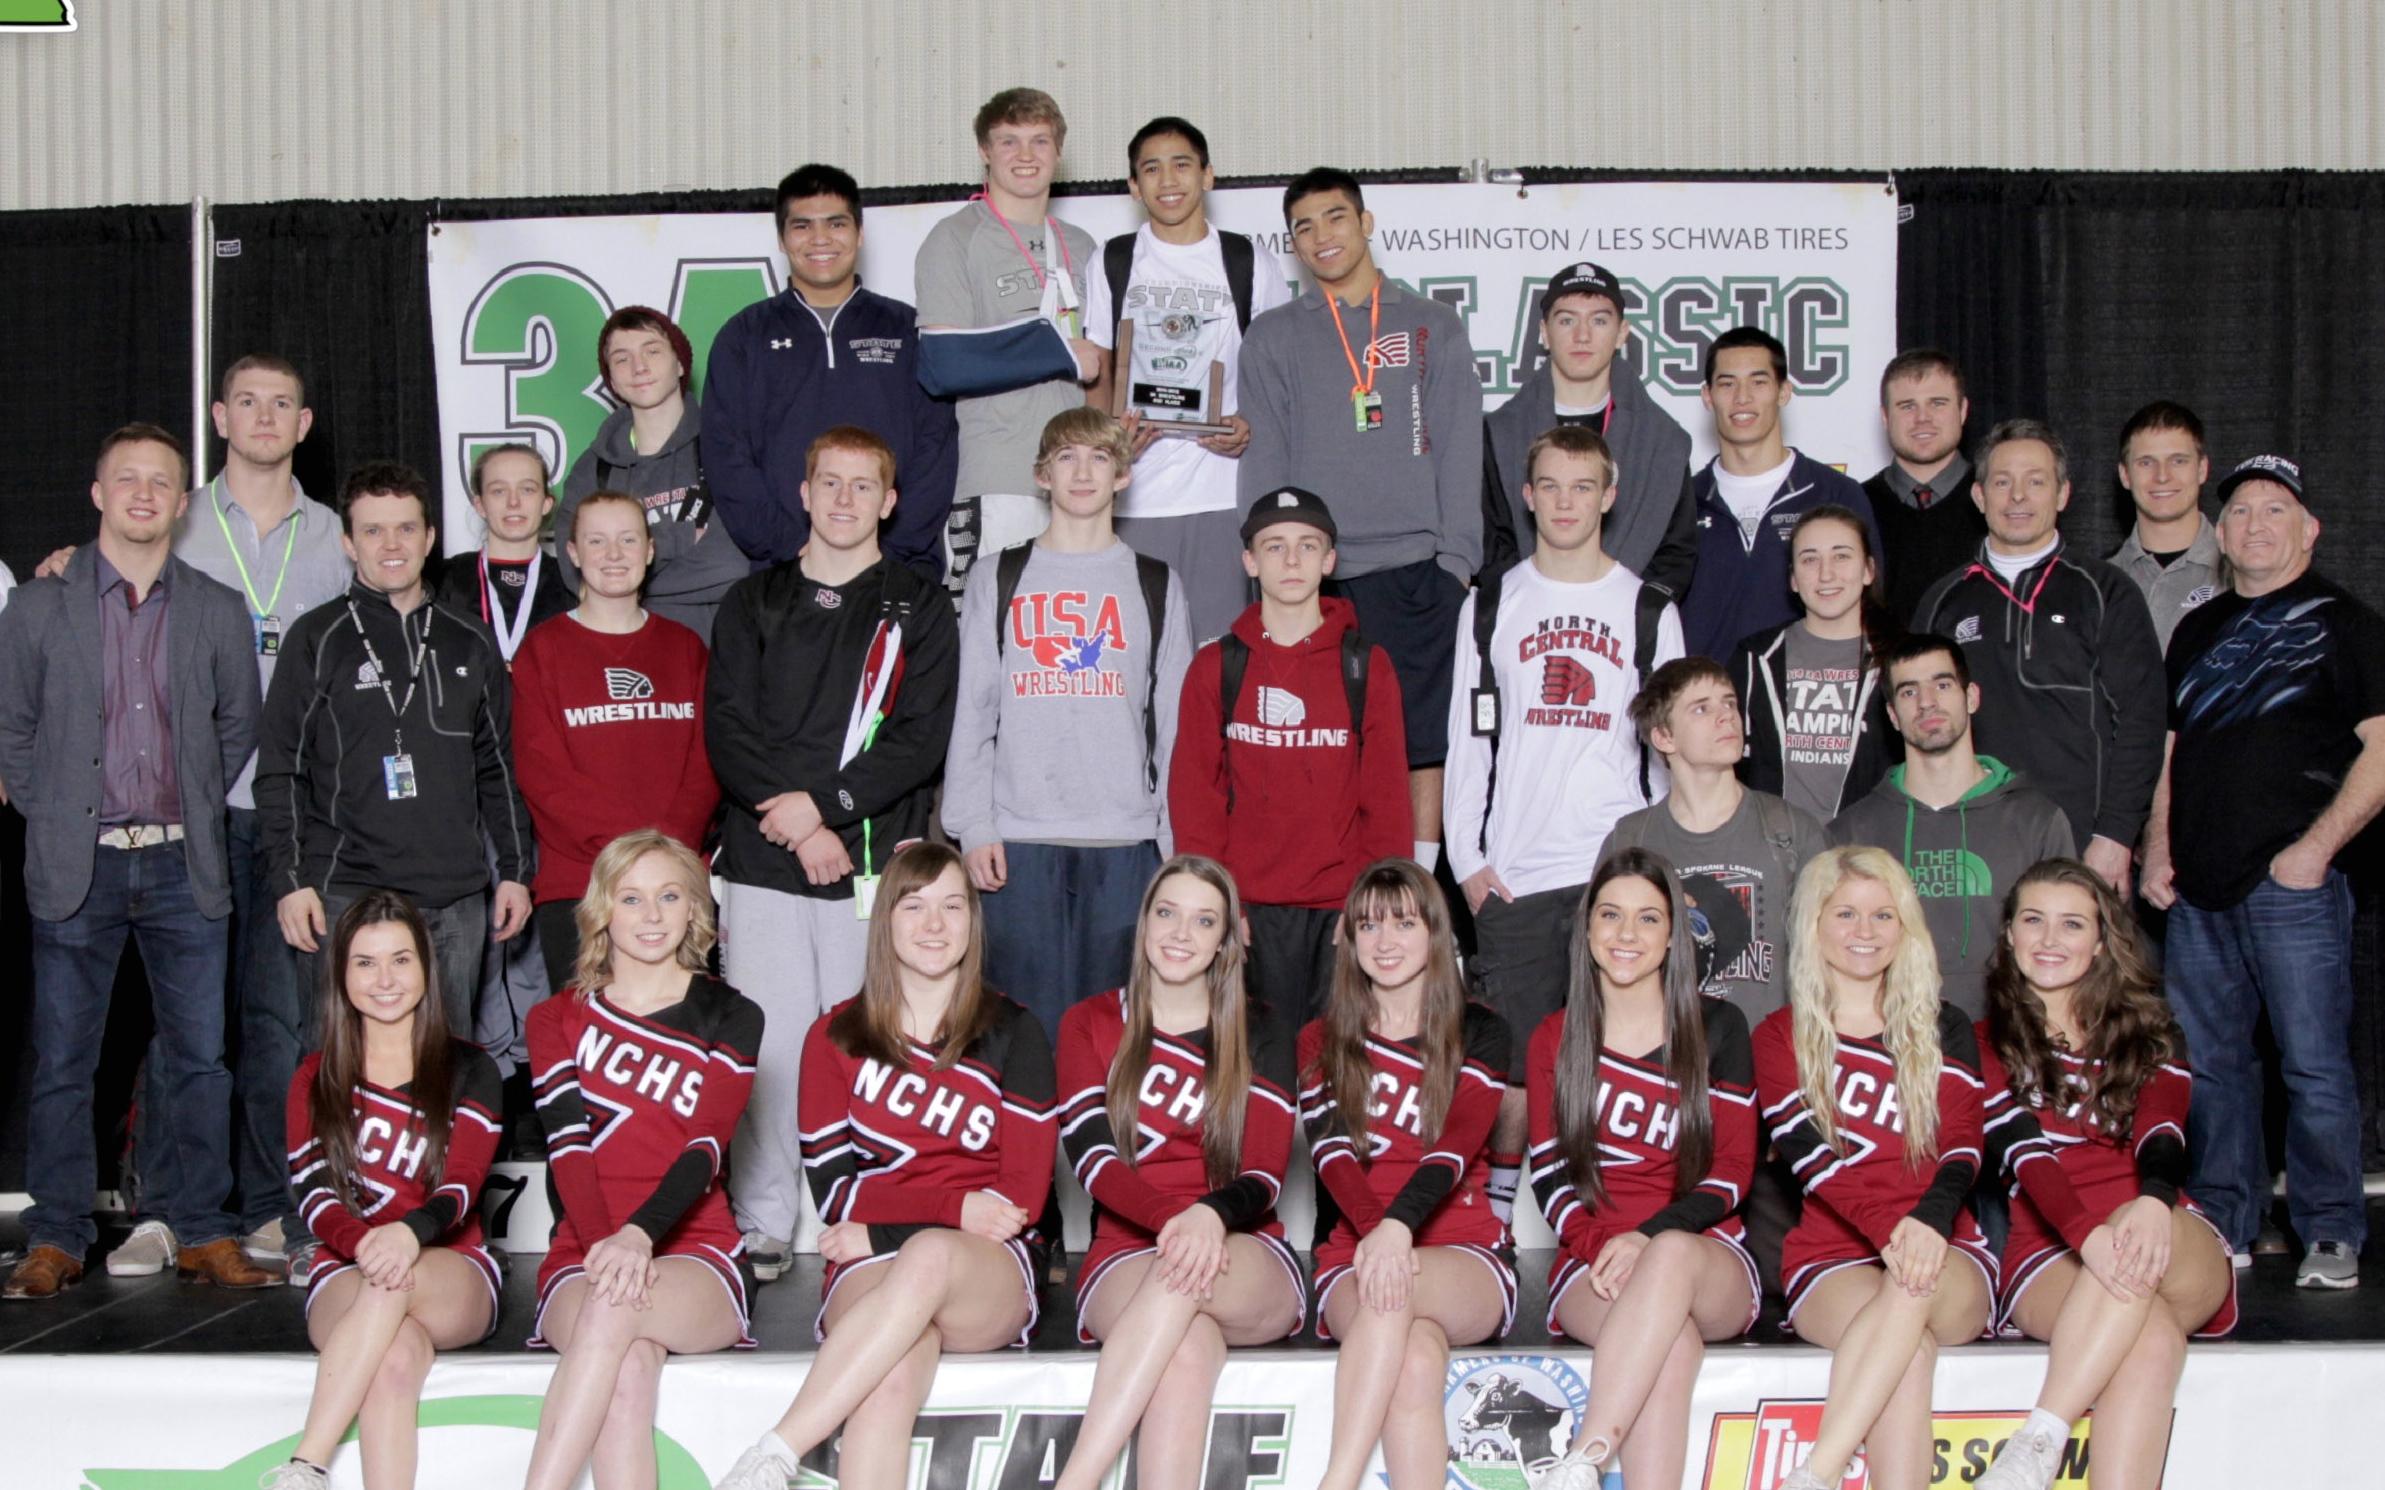 2015 State Runner-Ups